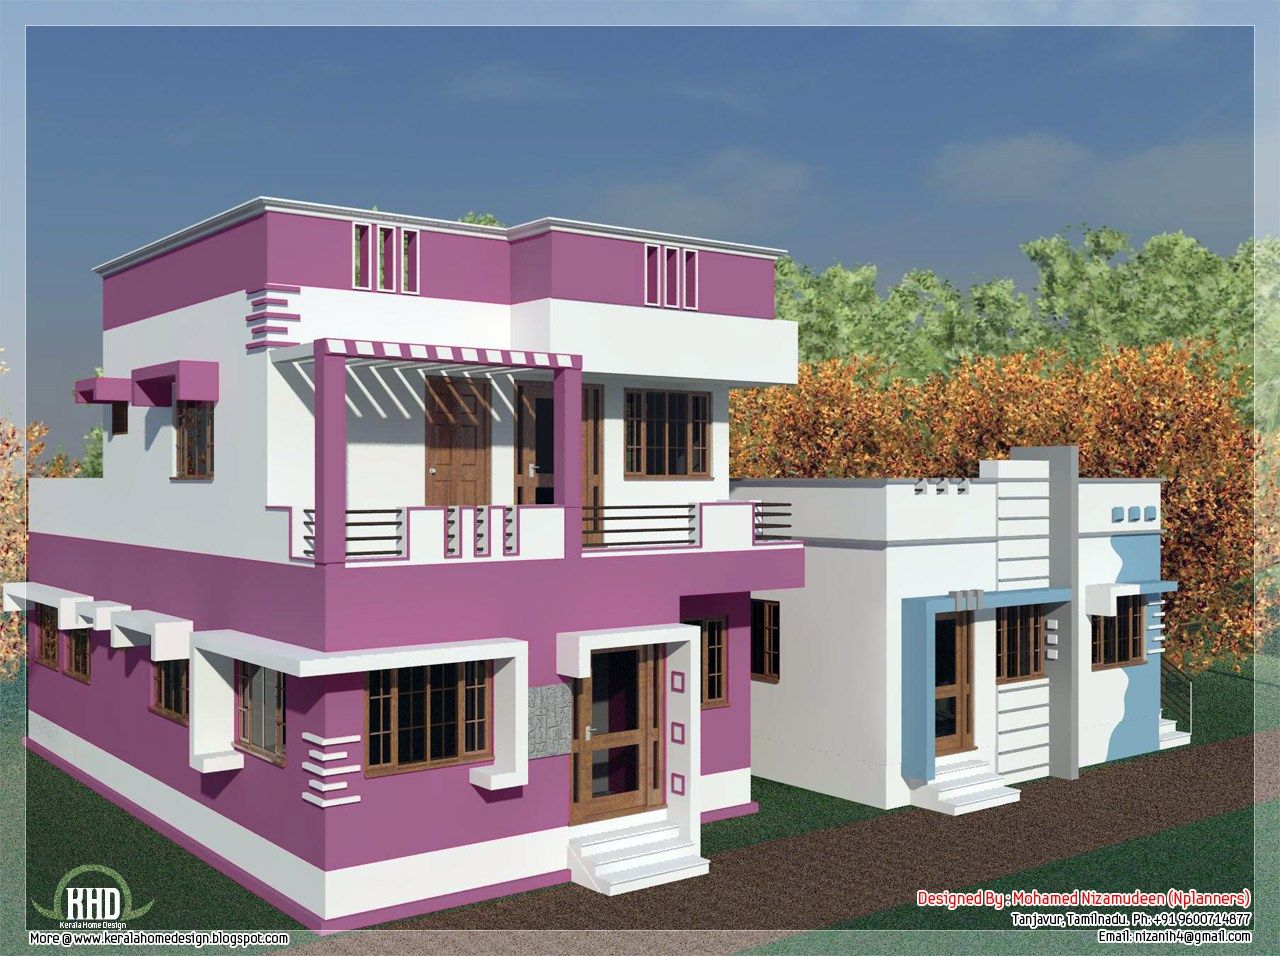 ef910894289b9c7c92e1f1505eb6ebde - 44+ Small House Design In Nepal  Pictures